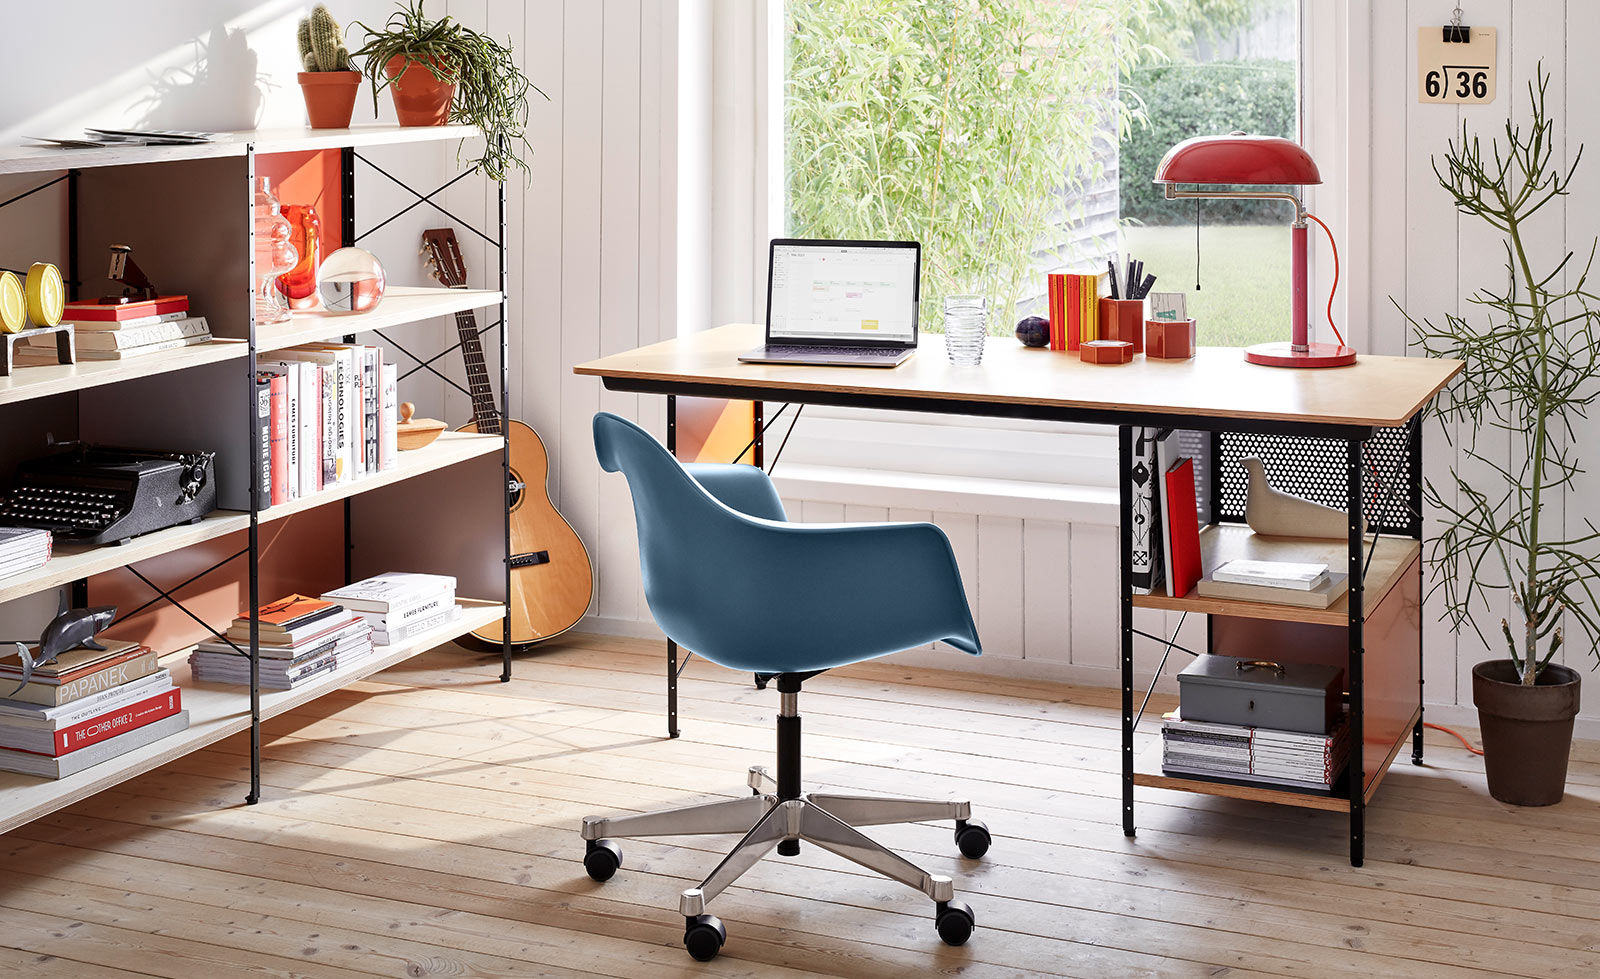 Think Furniture - Home Office Furniture - Home Office Desks